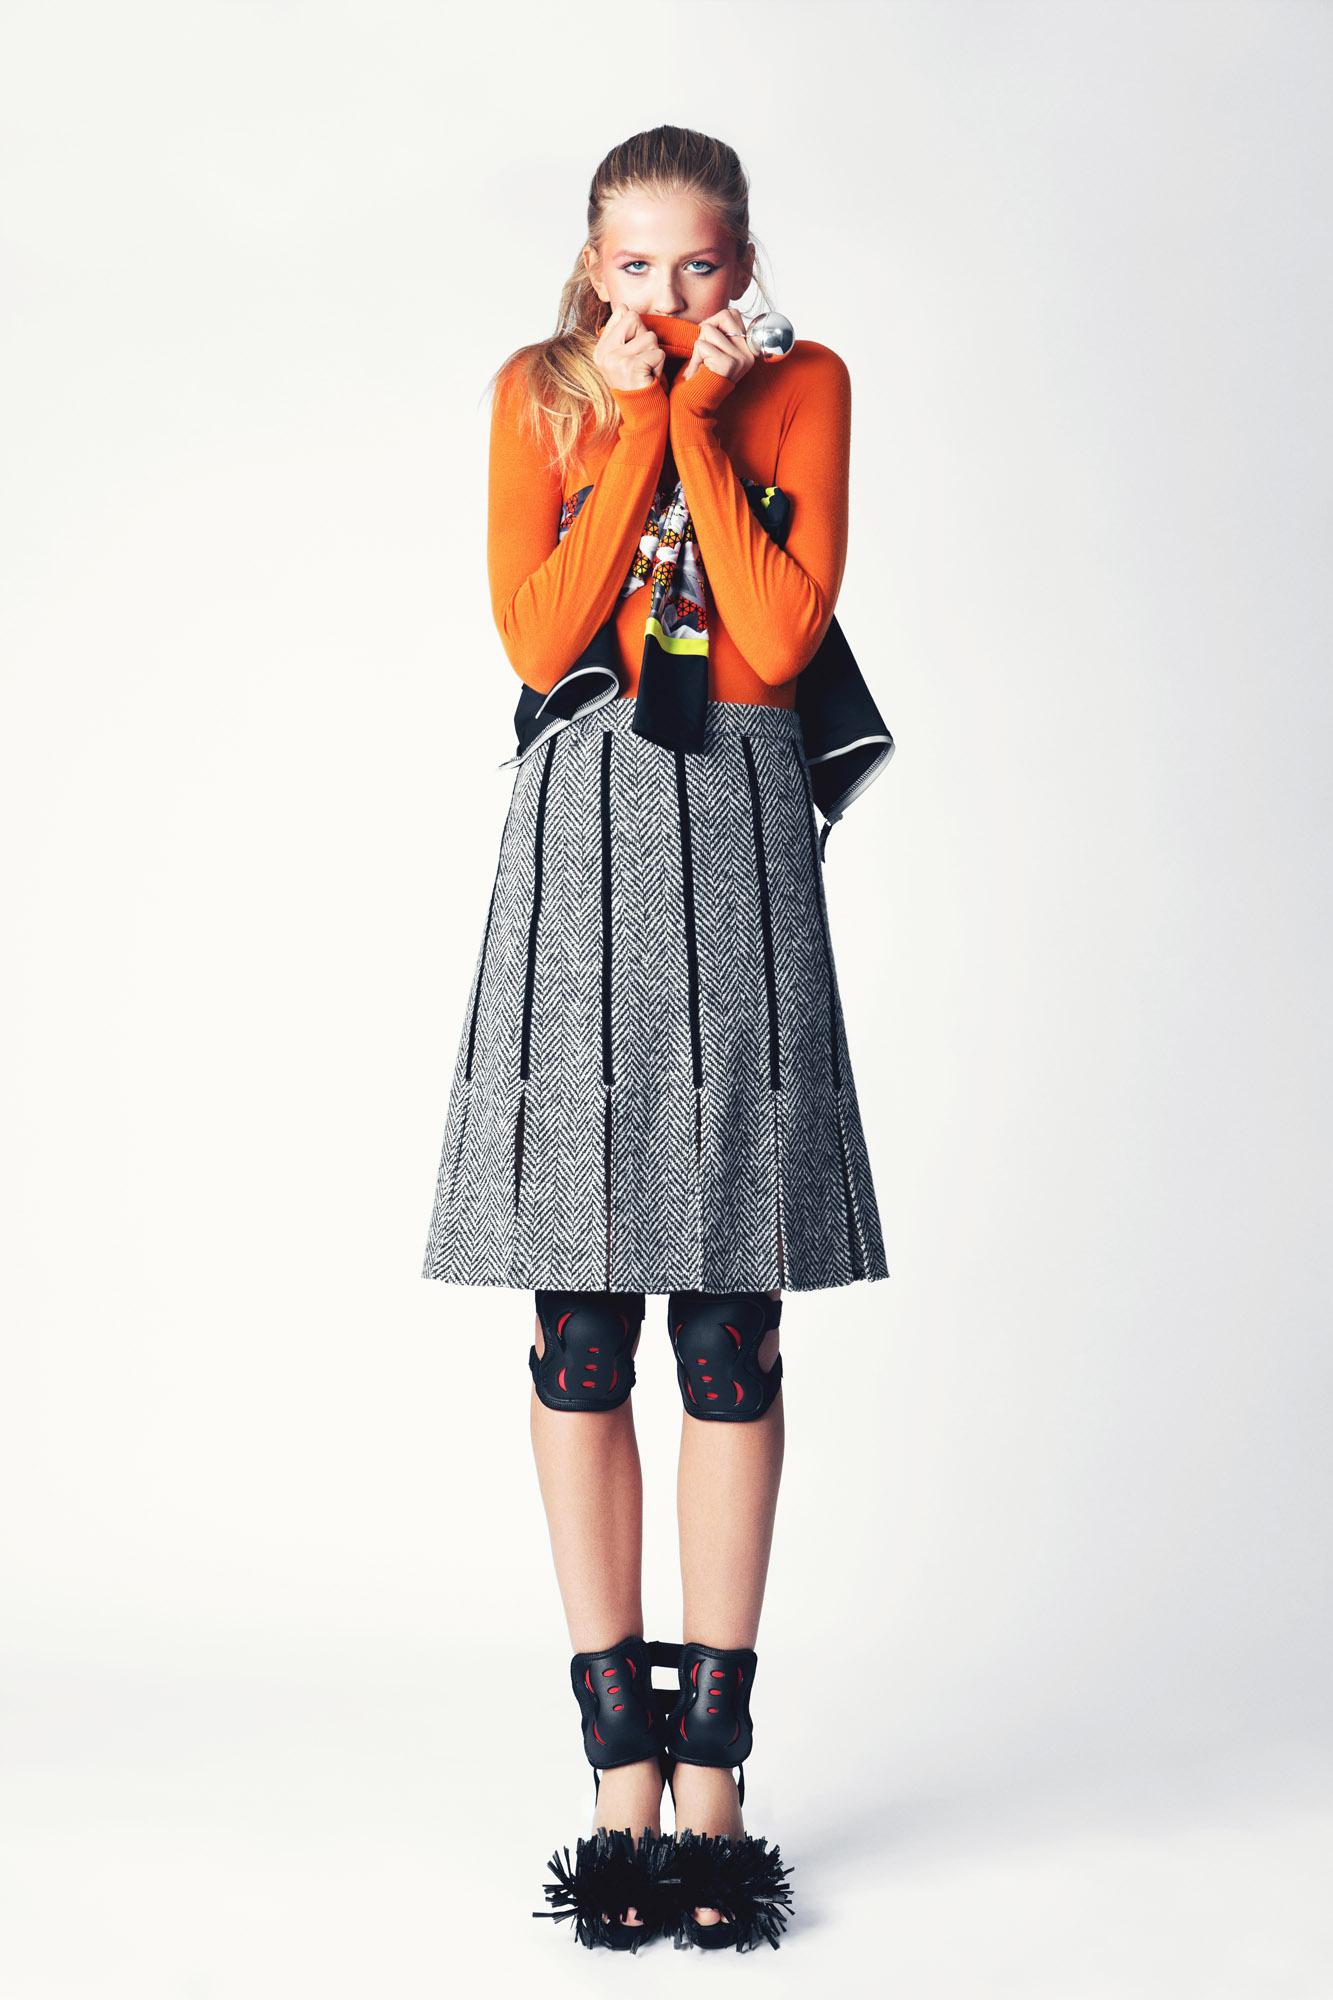 ALDONA wears -Orange Knit Top: KING & TUCKFIELD, Top: SPEEDO, Skirt: CATRIONA HANLEY,Heels: LONGSHAW WARD, Ring: CIVILIAN LONDON,Knee and Elbow pads: SLICK WILLIES